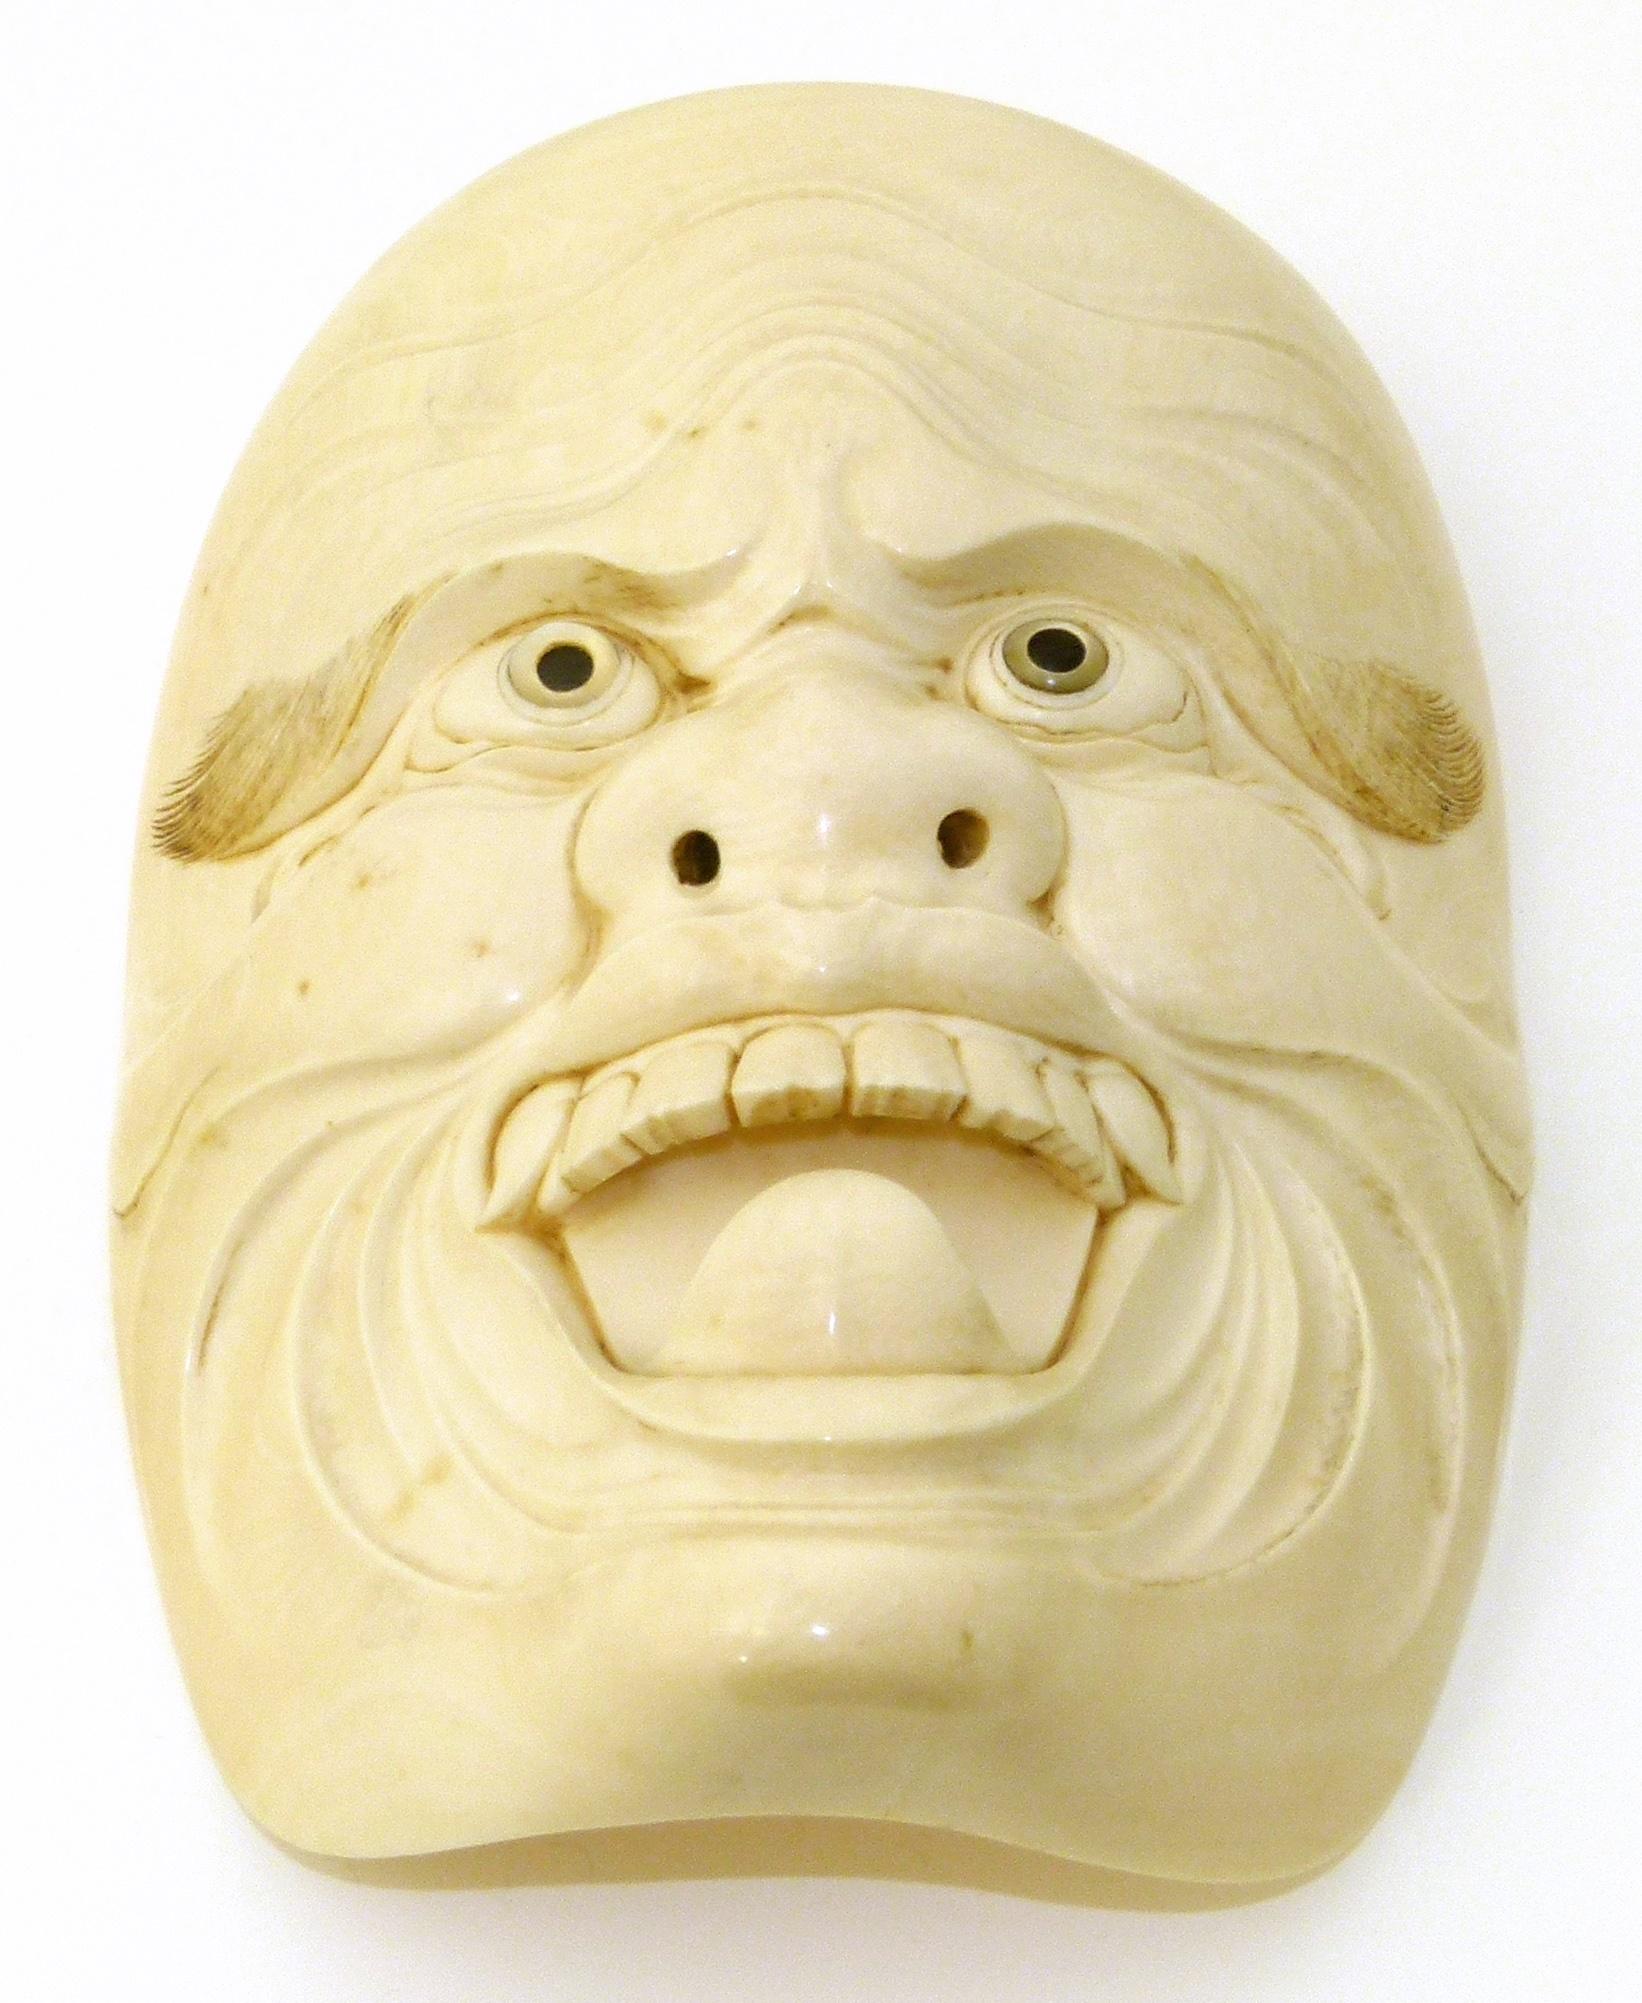 A Japanese Meji Period Ivory Noh Mask